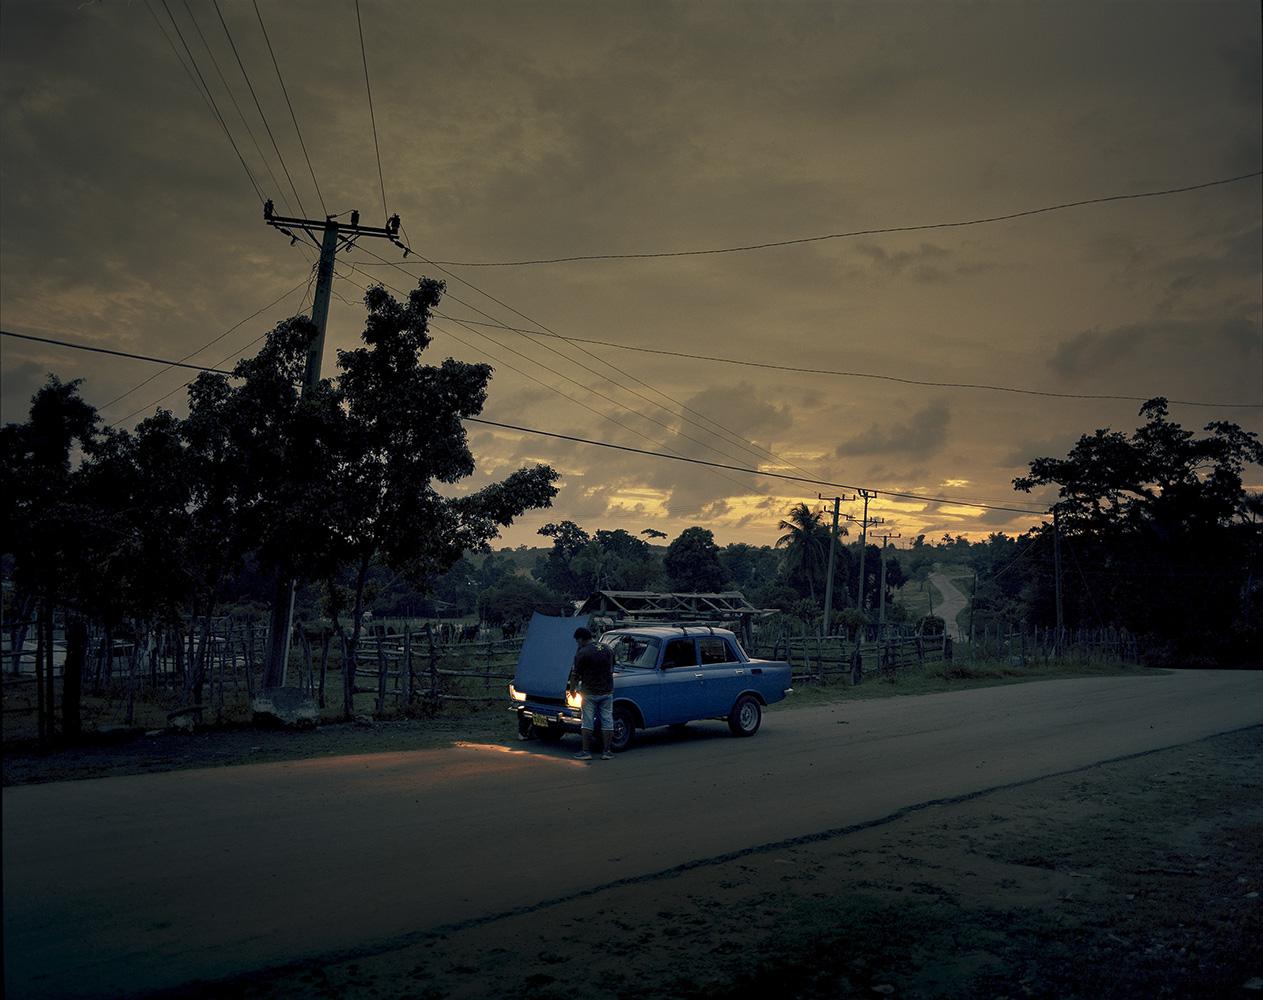 A man repairs car at dusk in the town El Brujo.